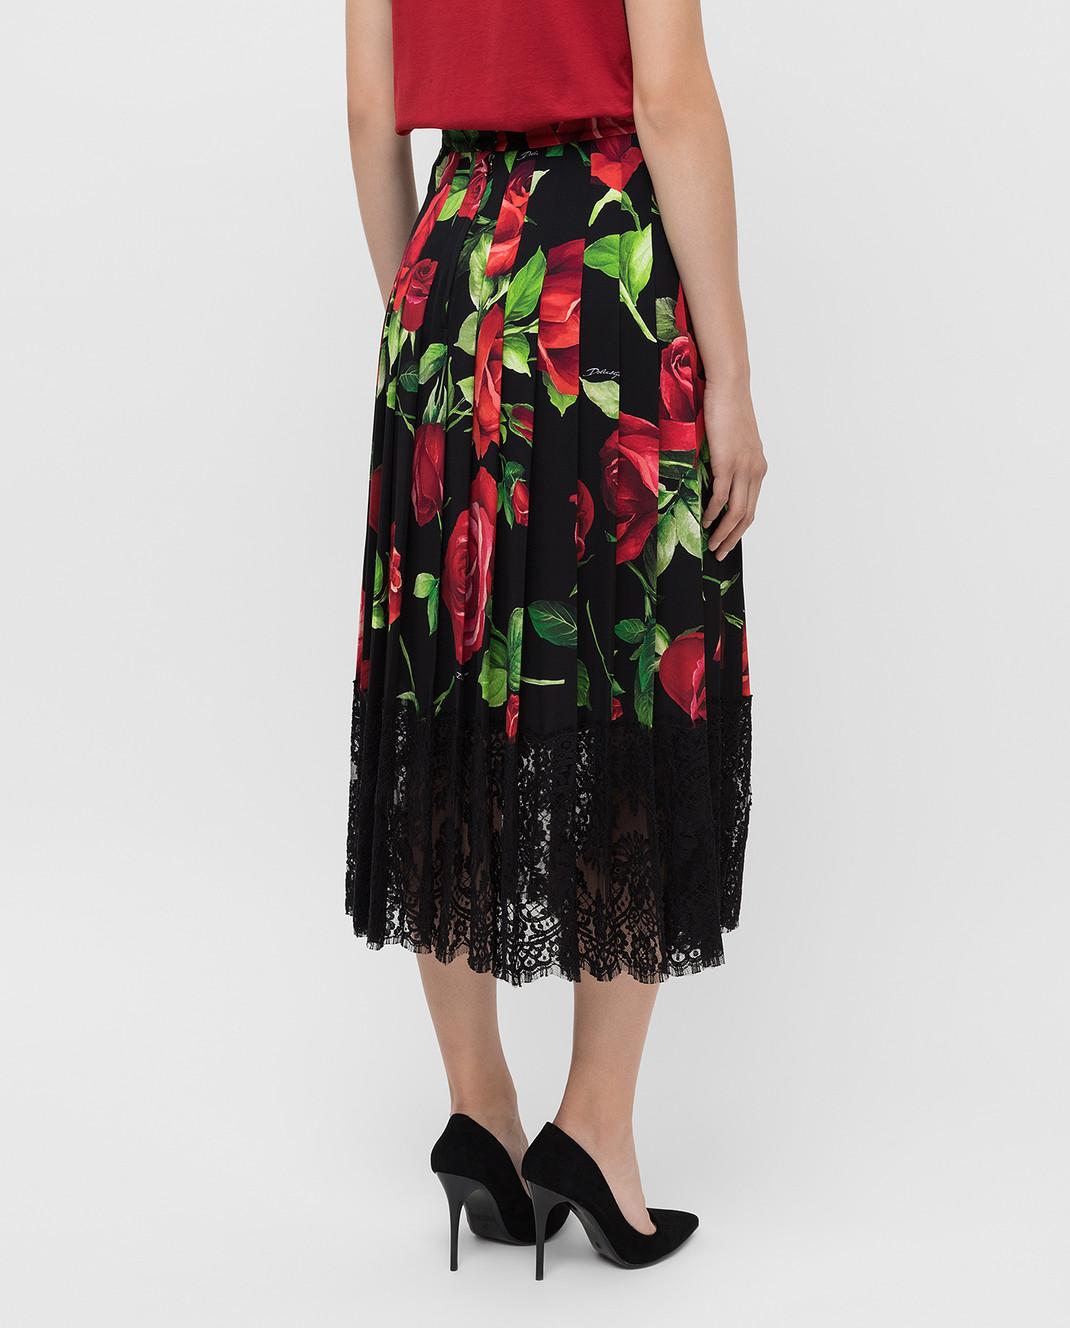 Dolce&Gabbana Черная юбка из шелка F4BFTTFSAY1 изображение 4